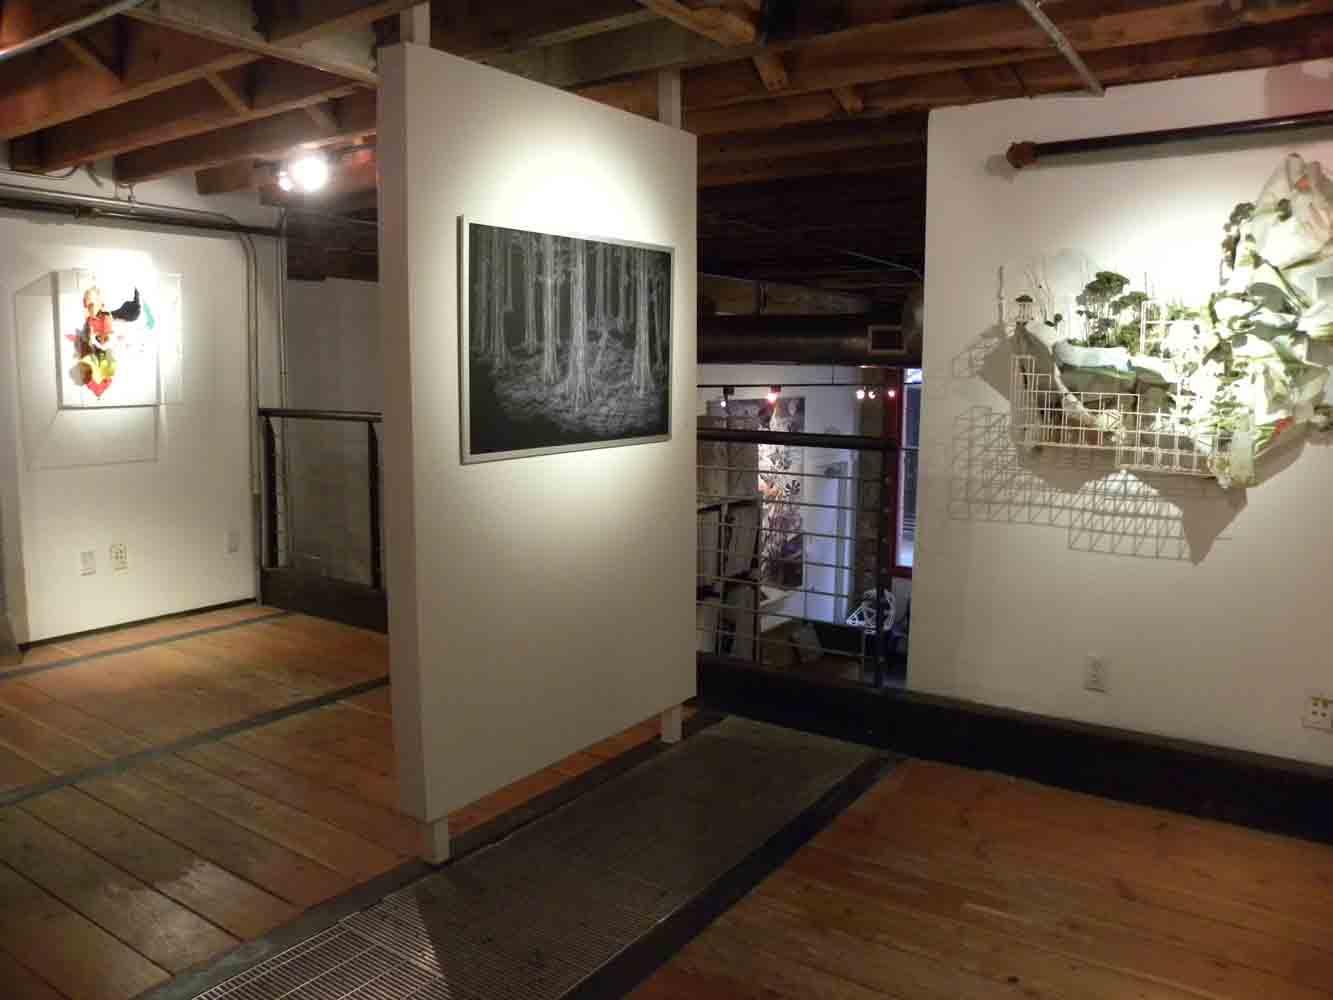 Loft Gallery Design and Fabrication